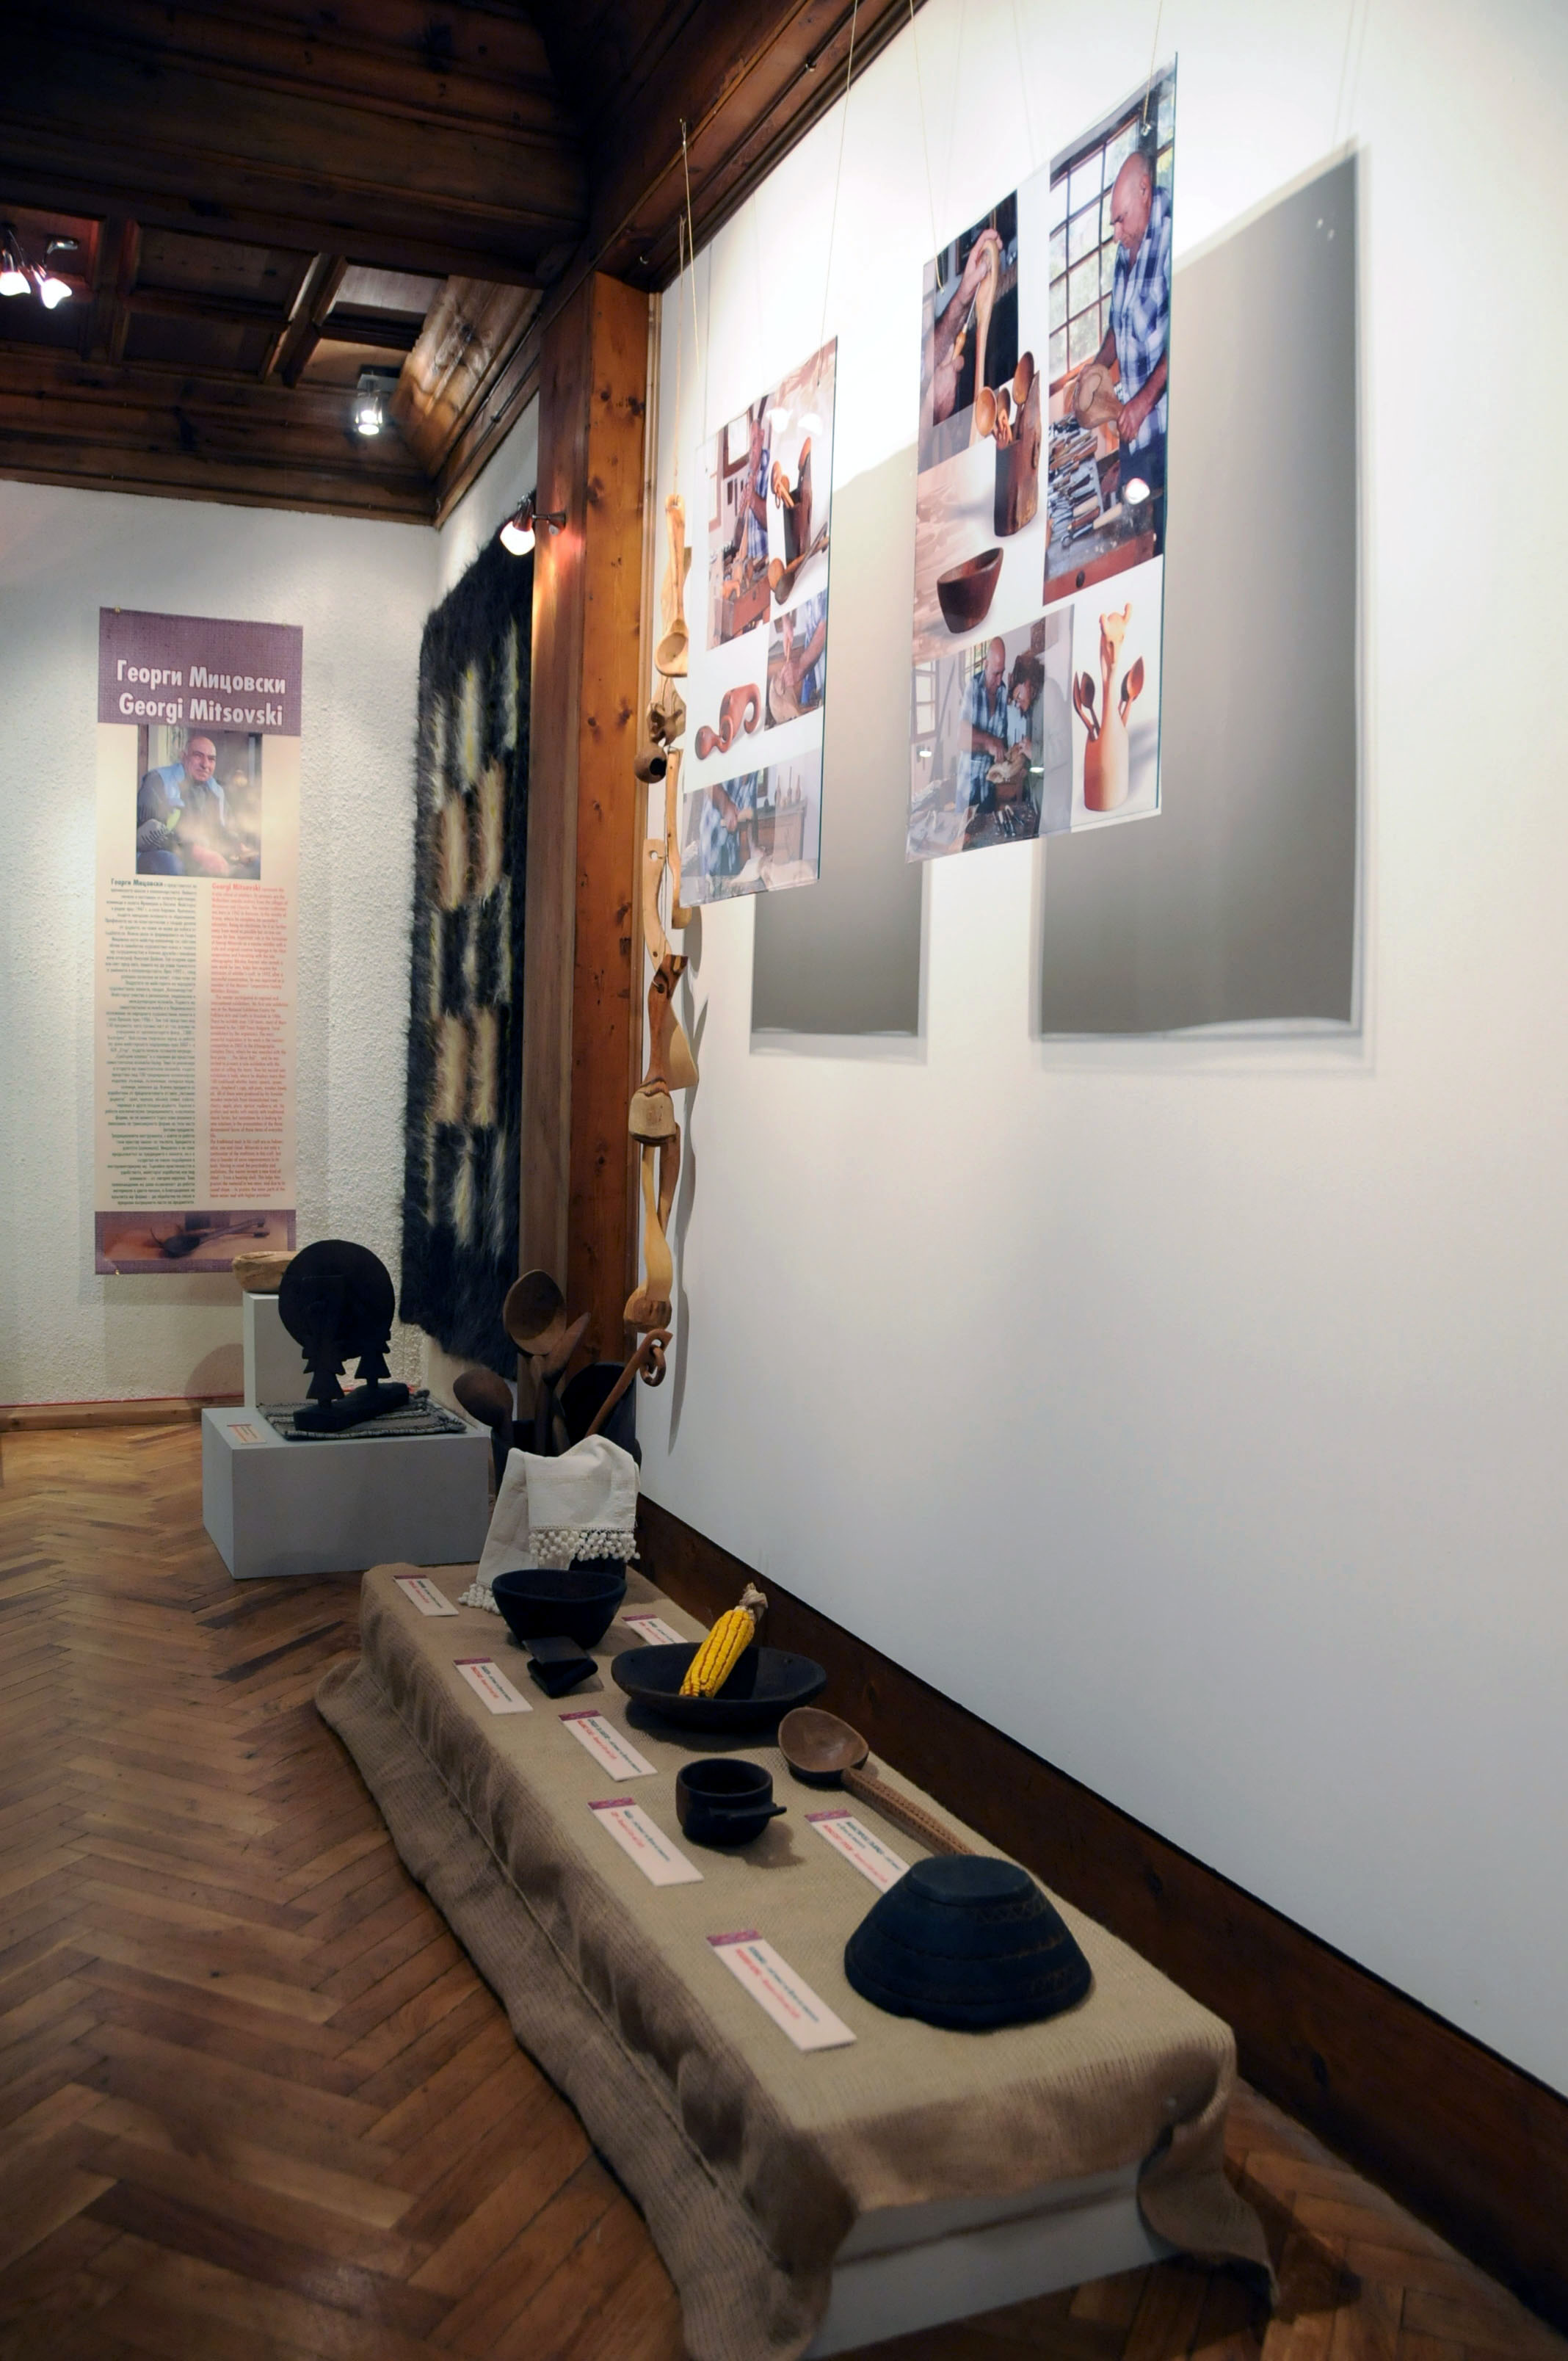 troyan-museum-kopanicharstvo-9